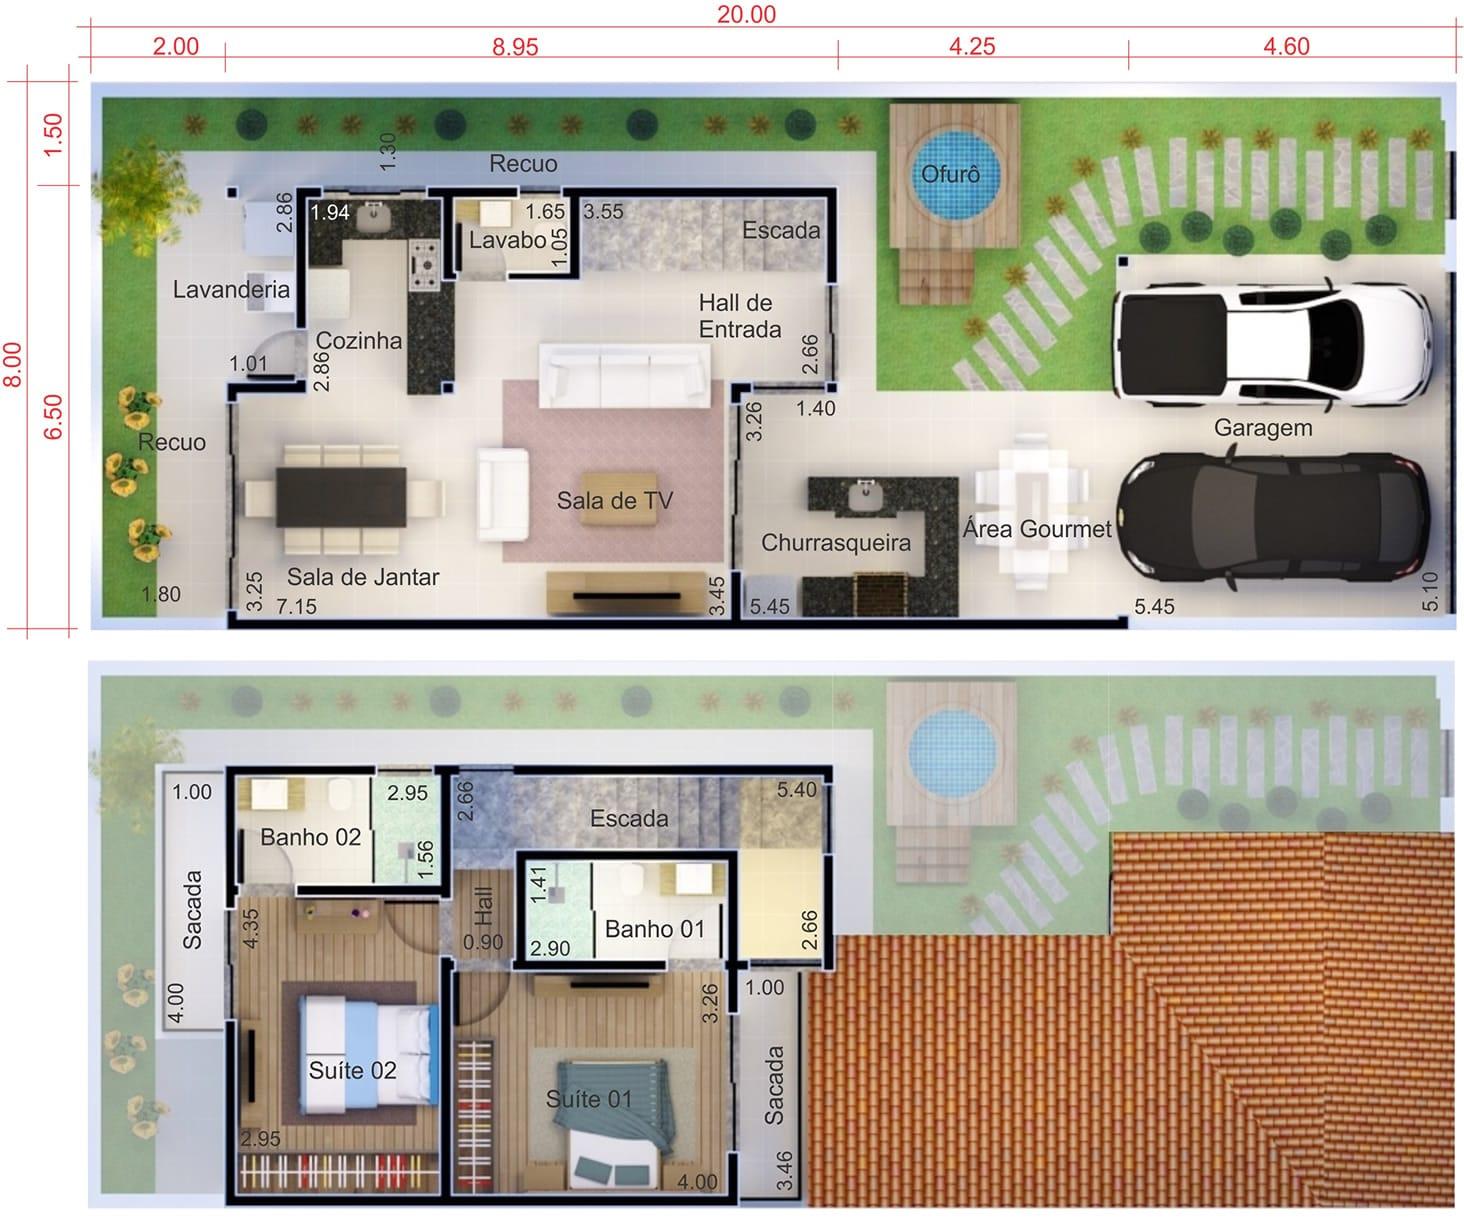 Planta De Casa Barata Projetos De Casas Modelos De